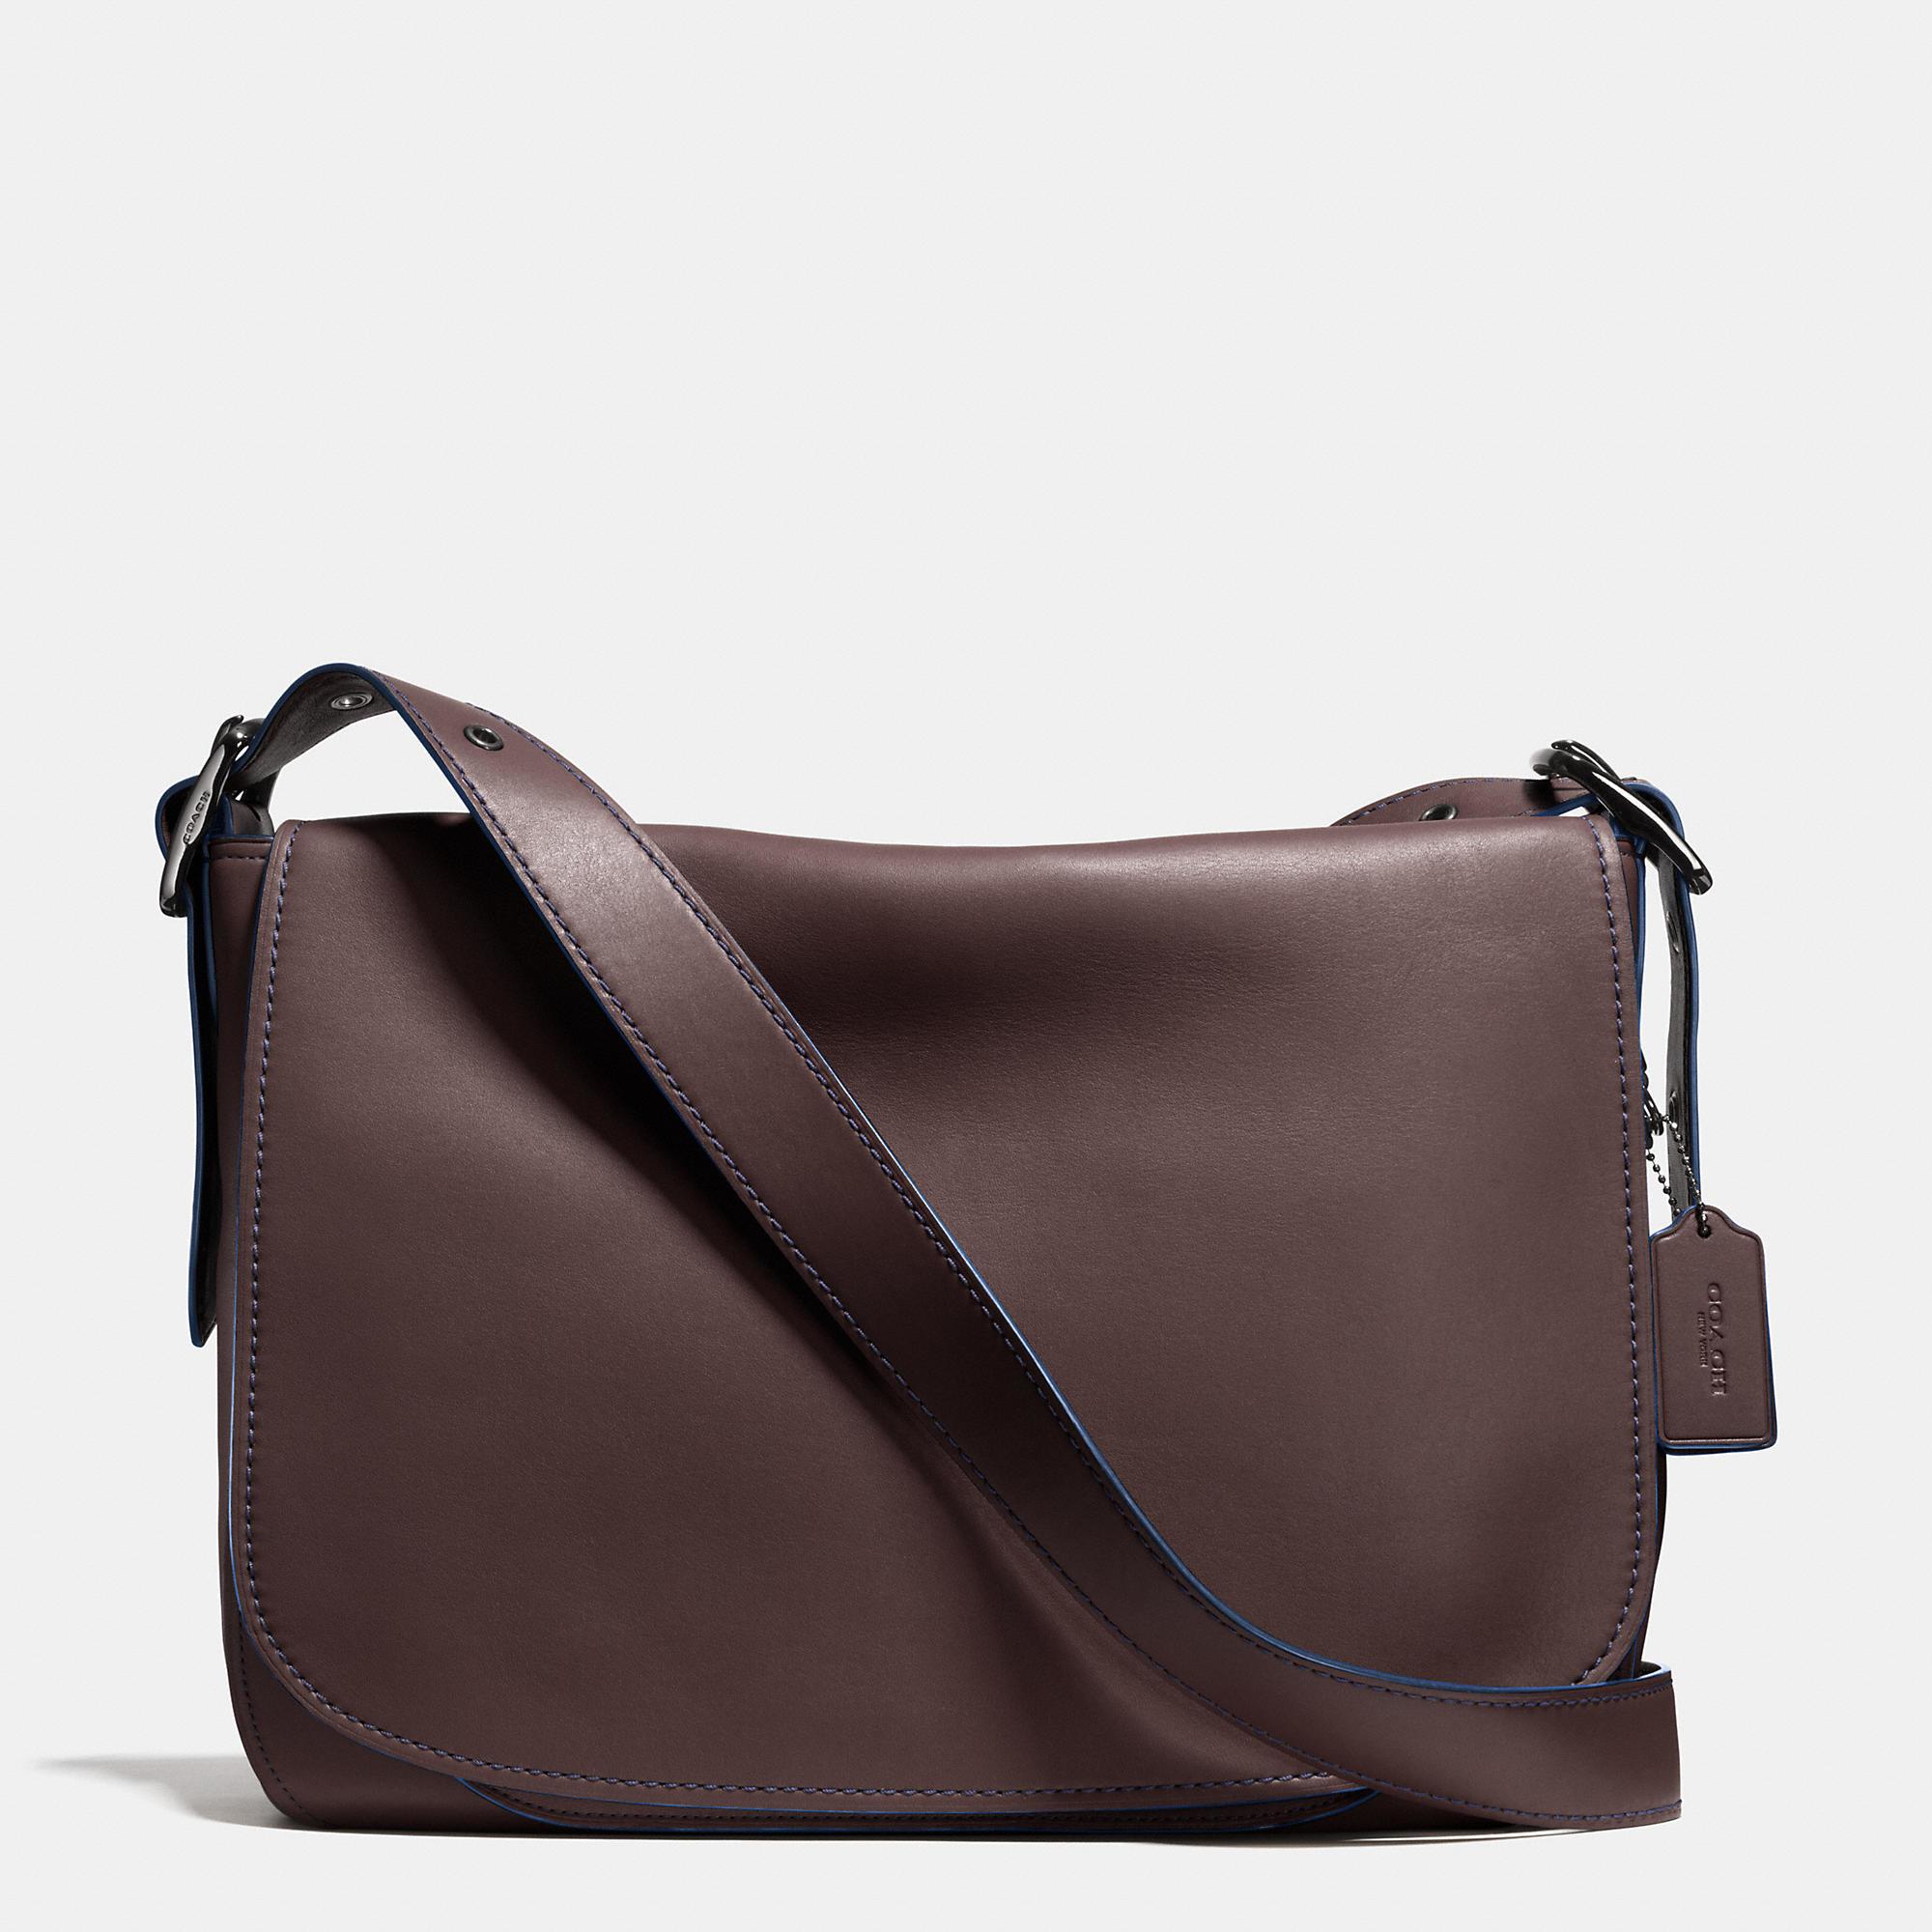 Coach Saddle Bag Messenger 38 In Glovetanned Leather in ... Saddle Bag